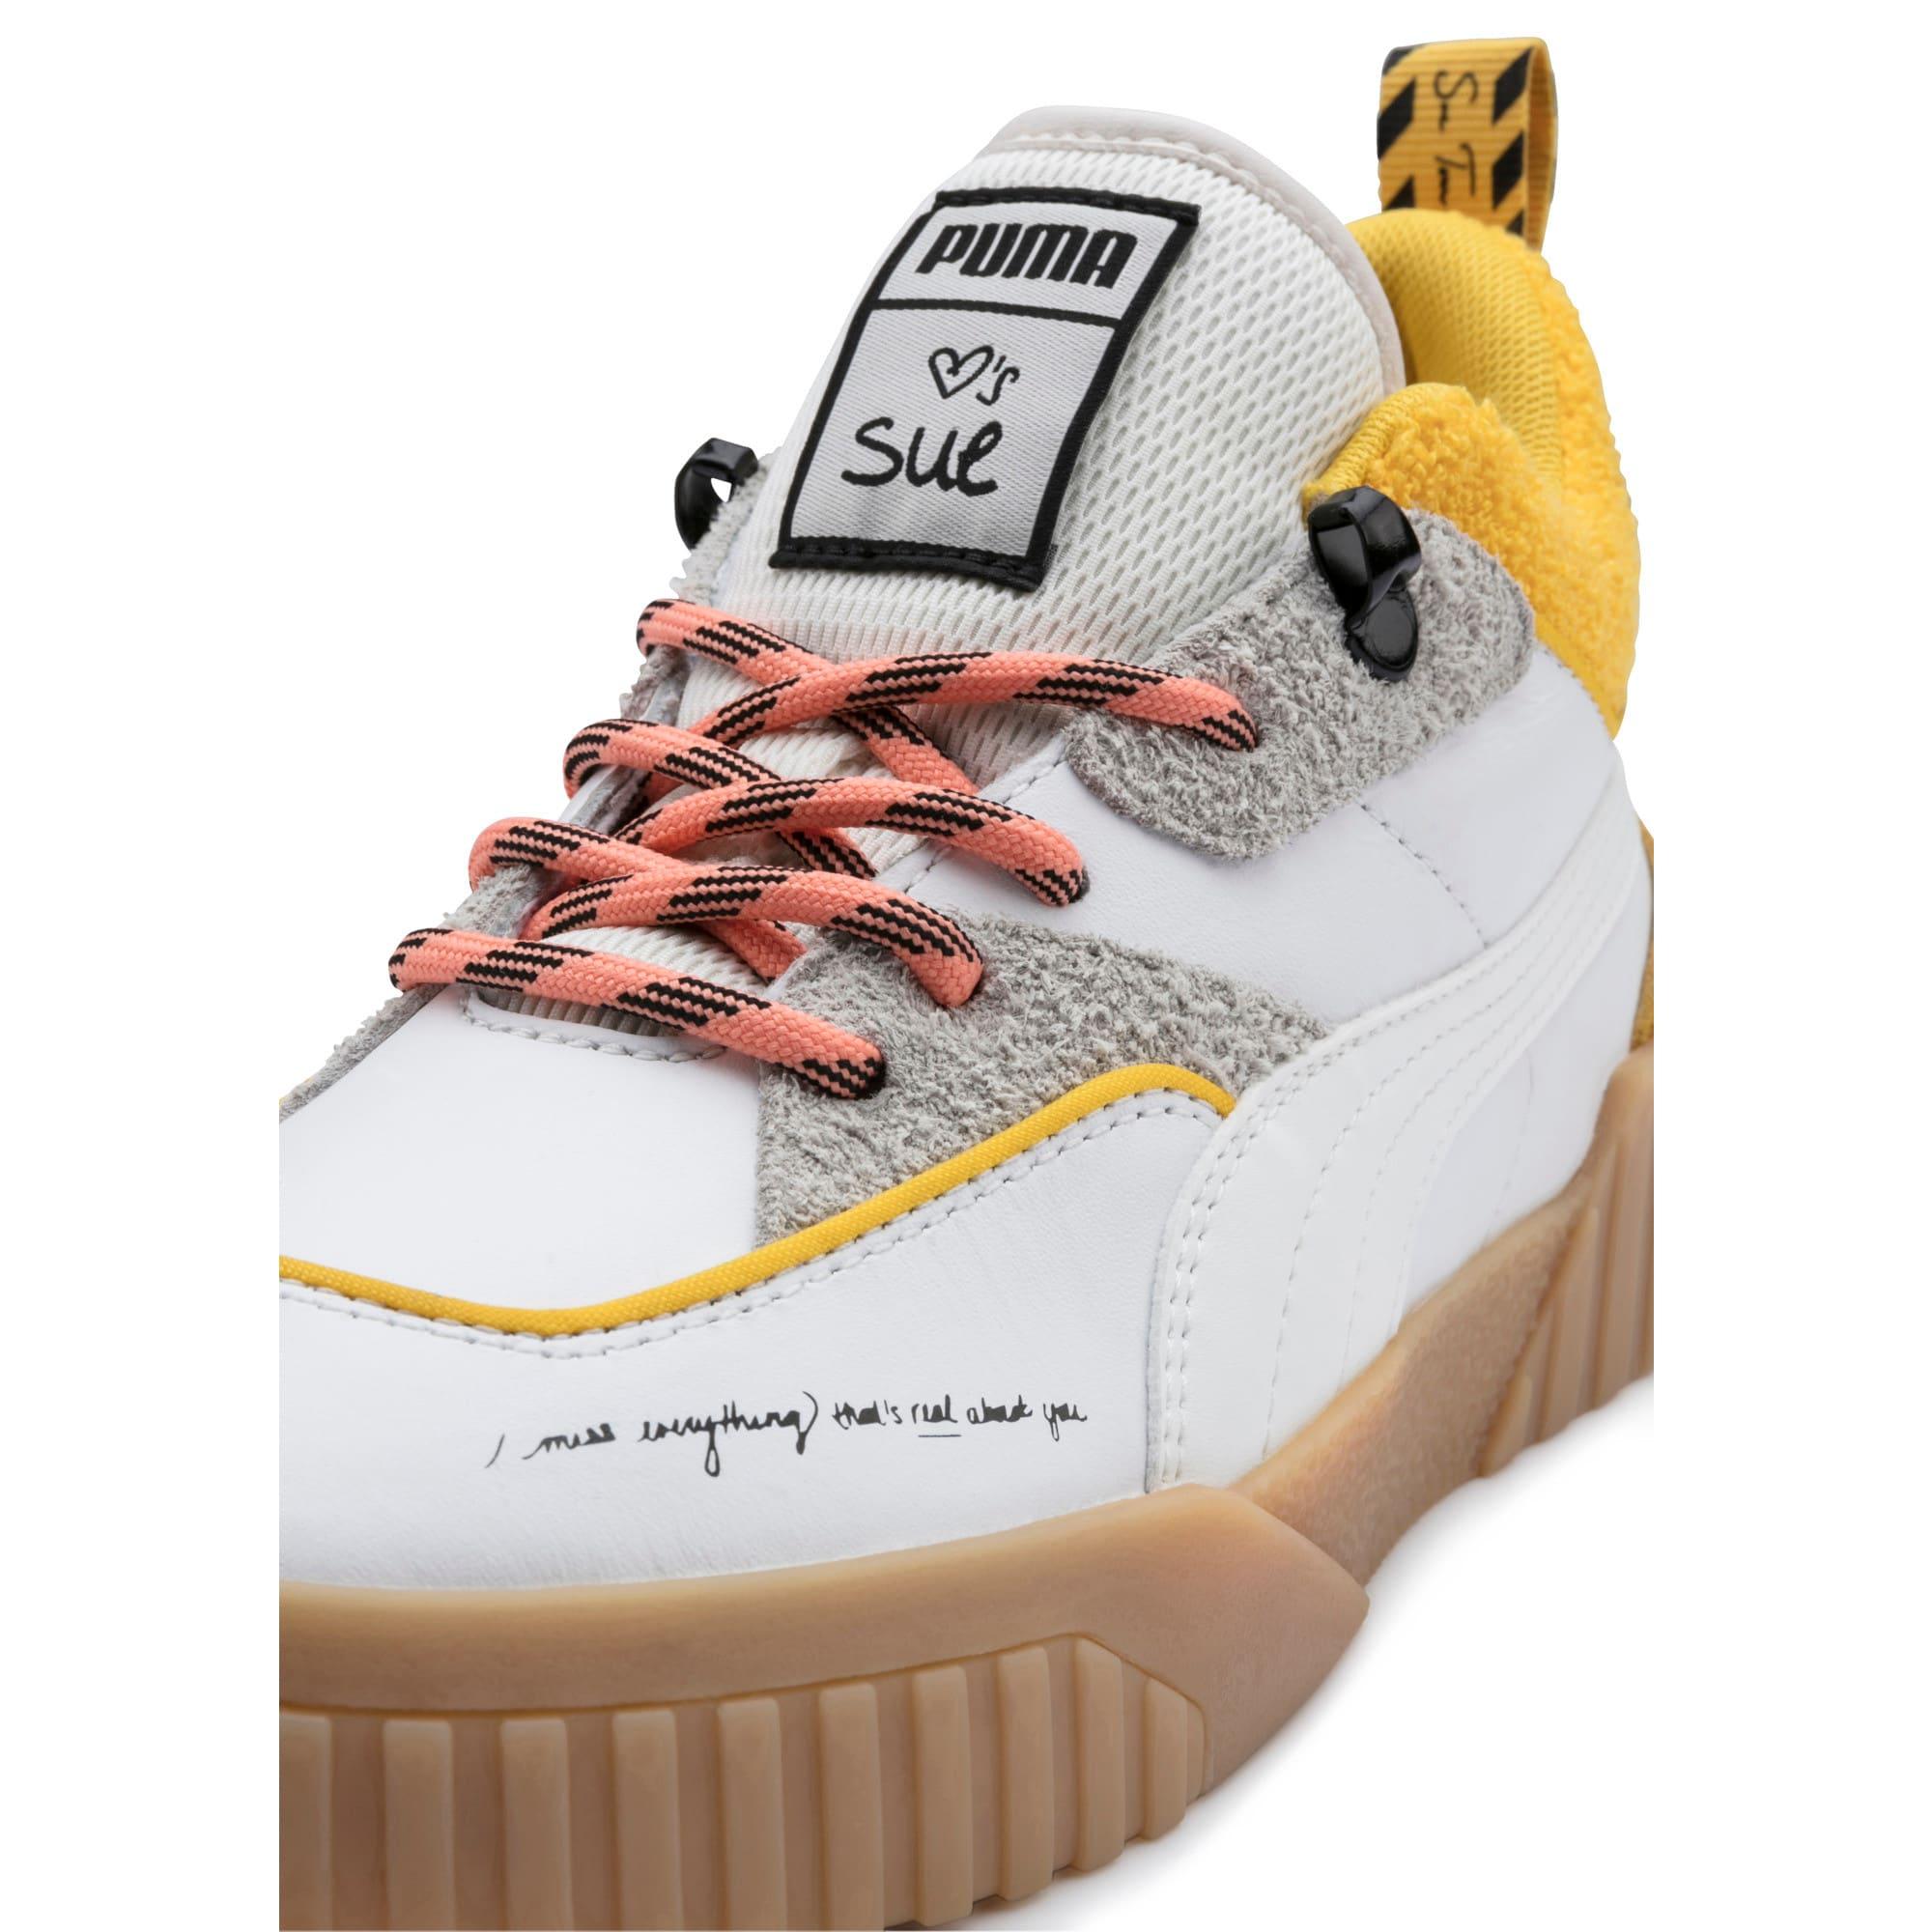 Thumbnail 7 of PUMA x SUE TSAI Cali Women's Sneakers, Bright White-Bright White, medium